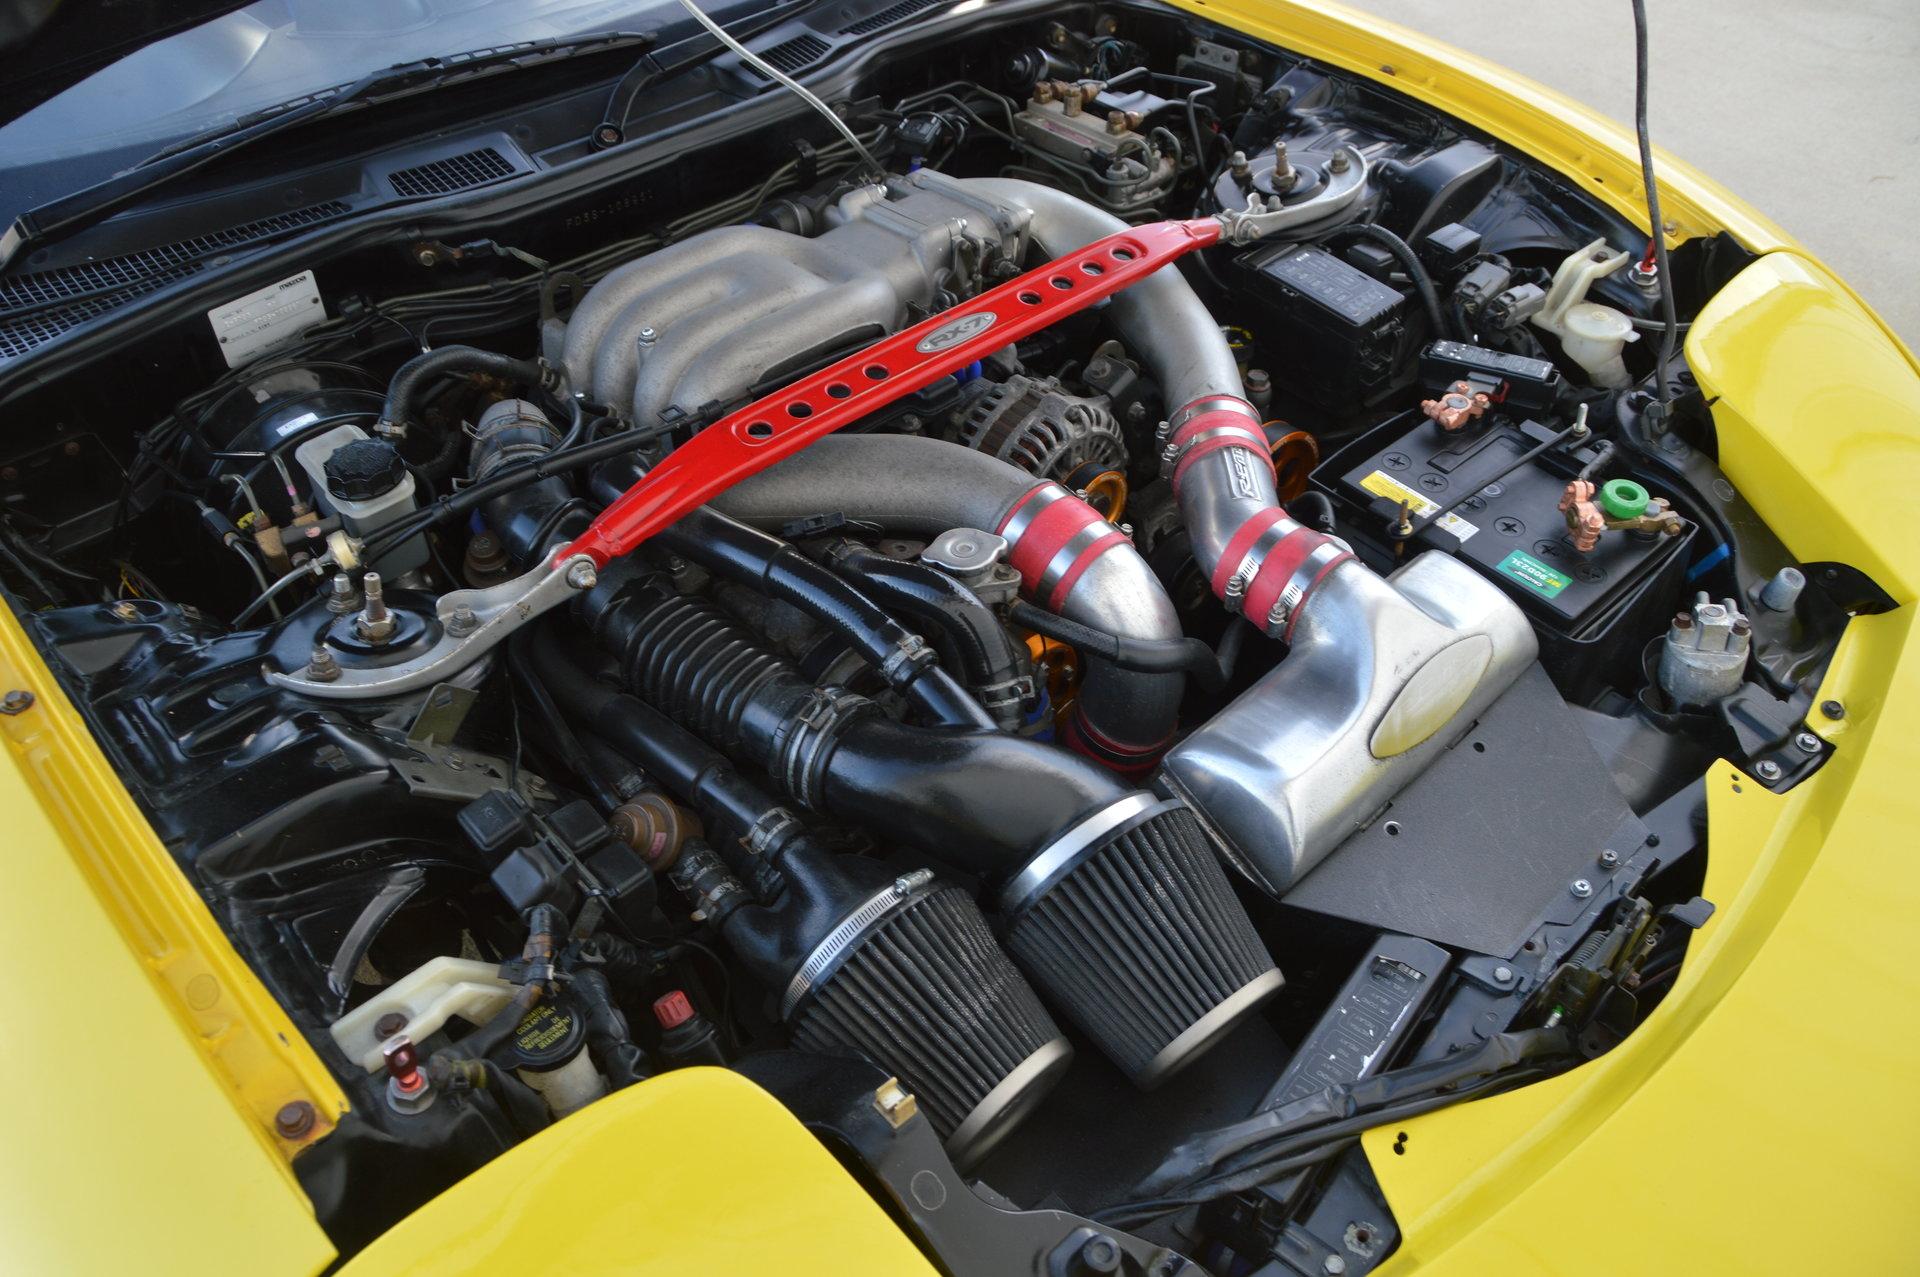 1992 Mazda Rx 7 For Sale 80151 Mcg Rx7 Engine